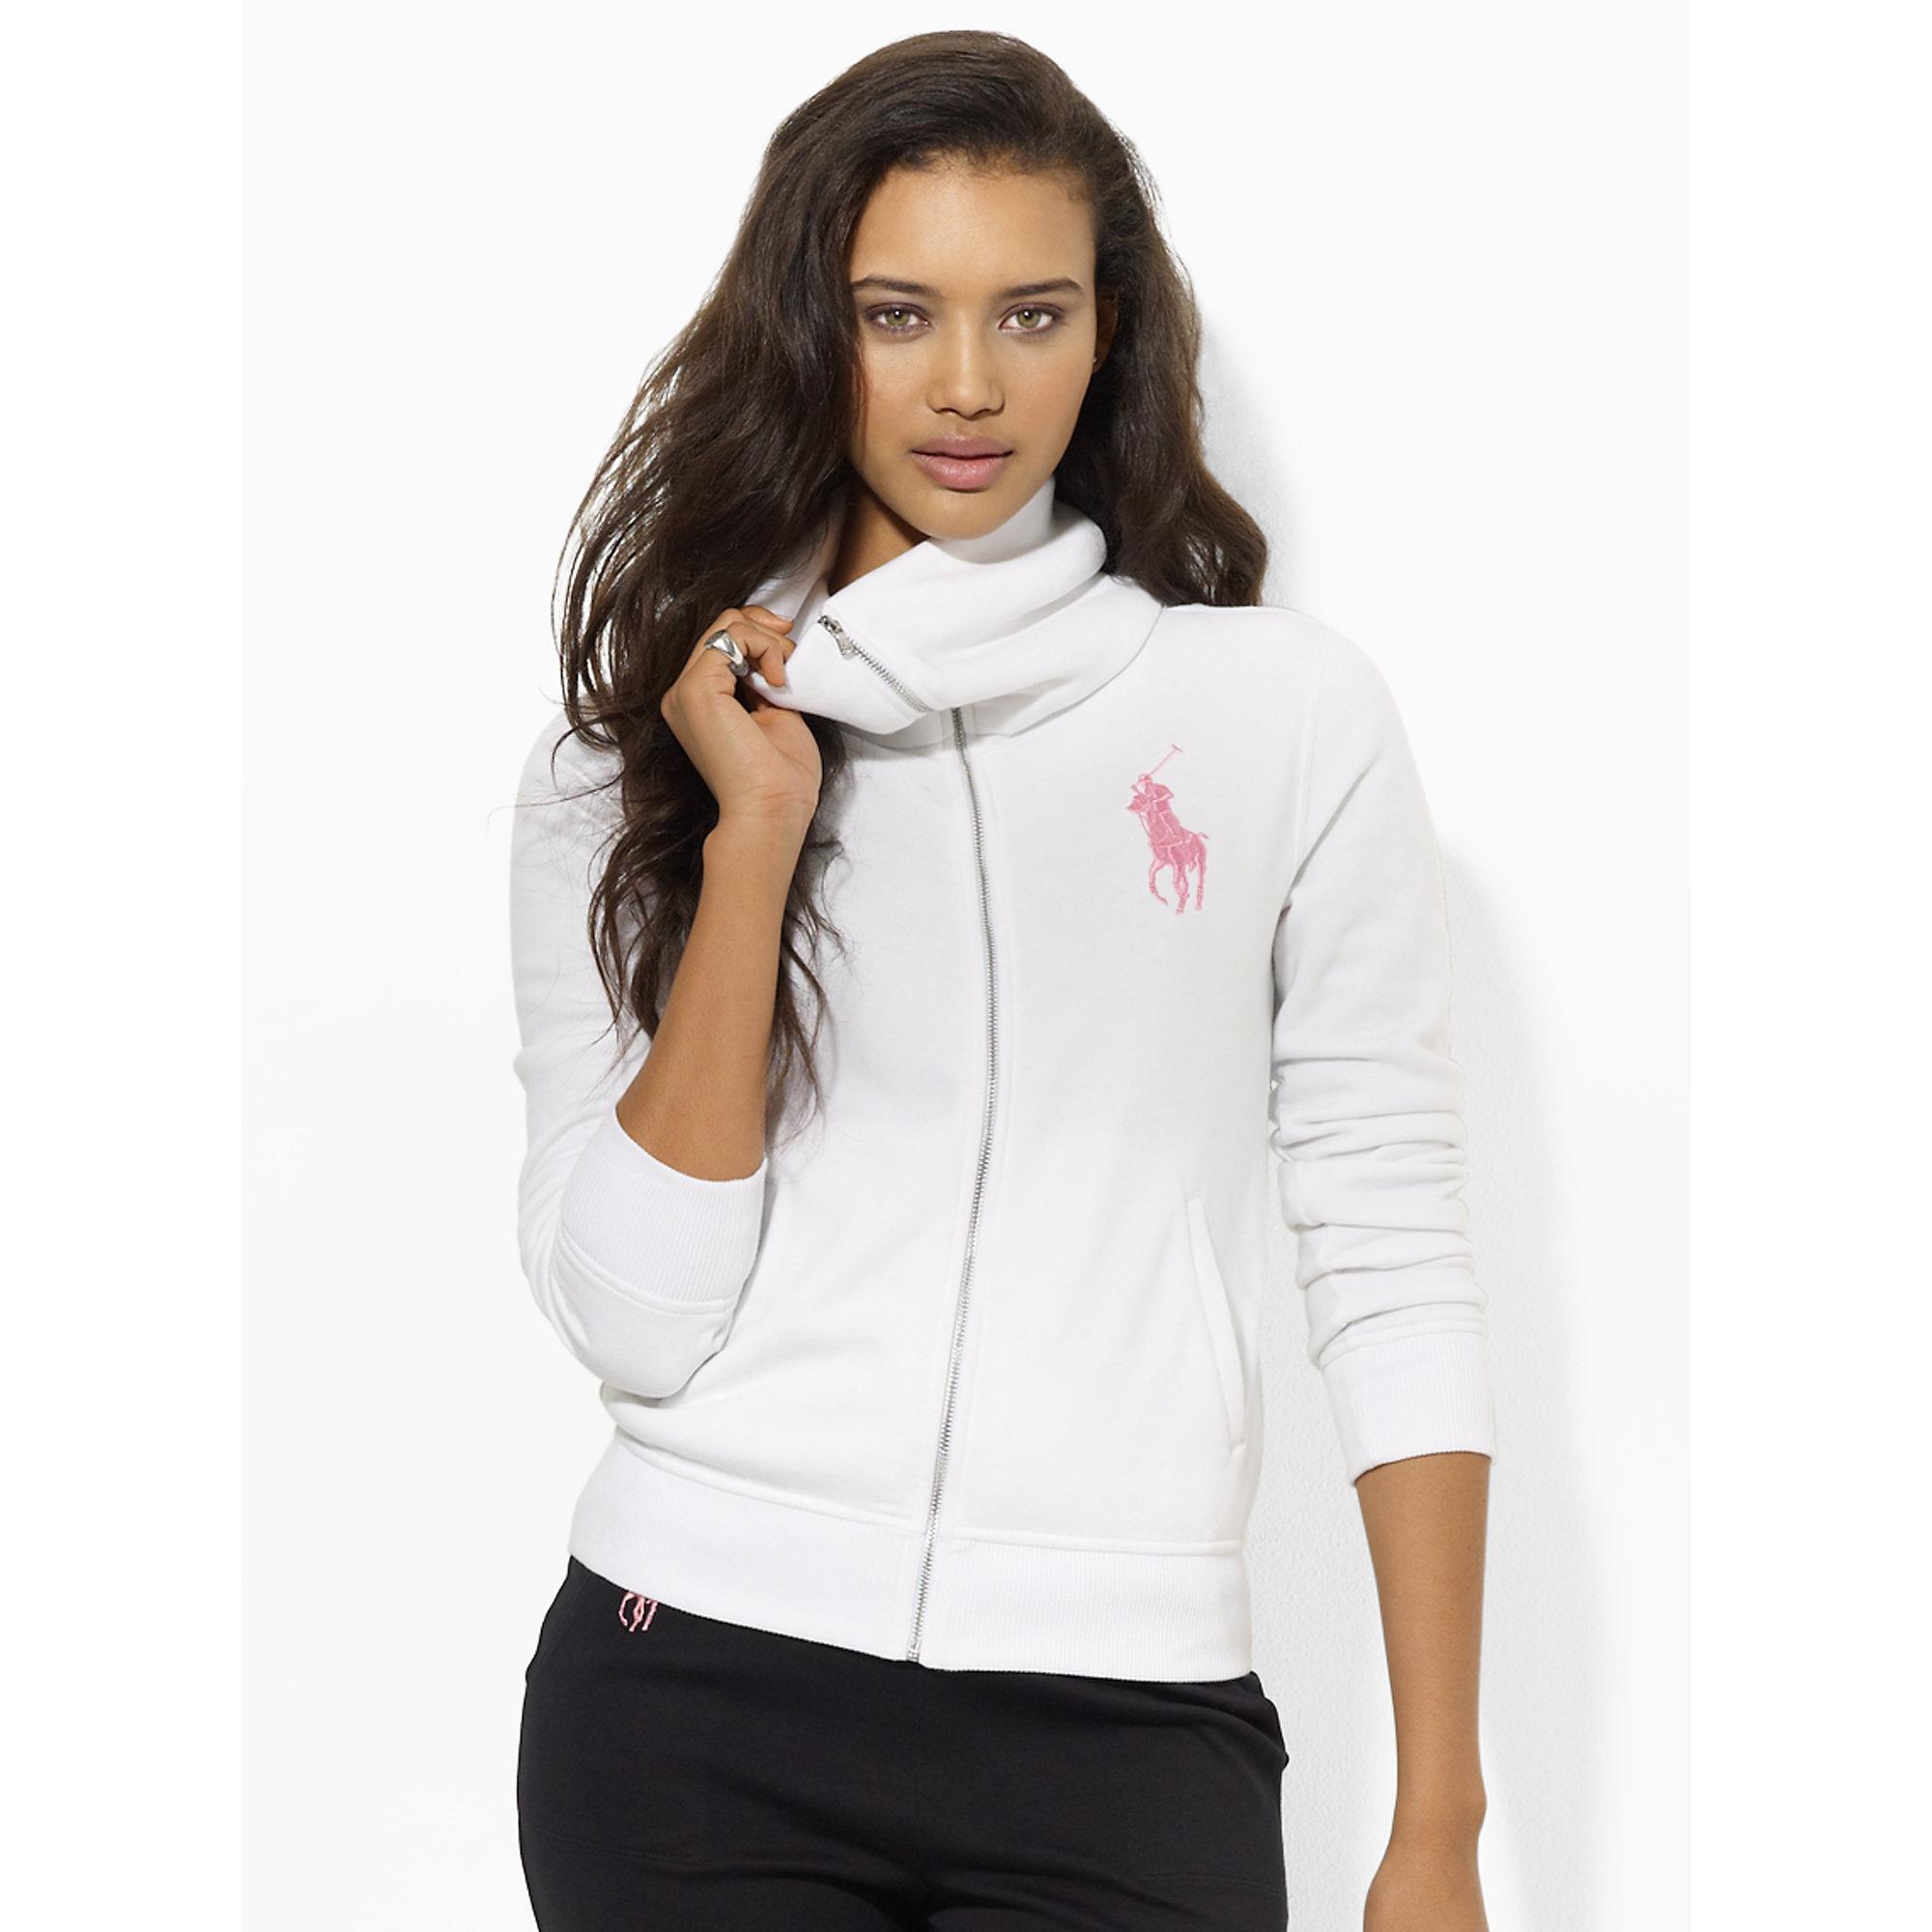 Lyst - Pink Pony Pink Pony Full-zip Jacket in White